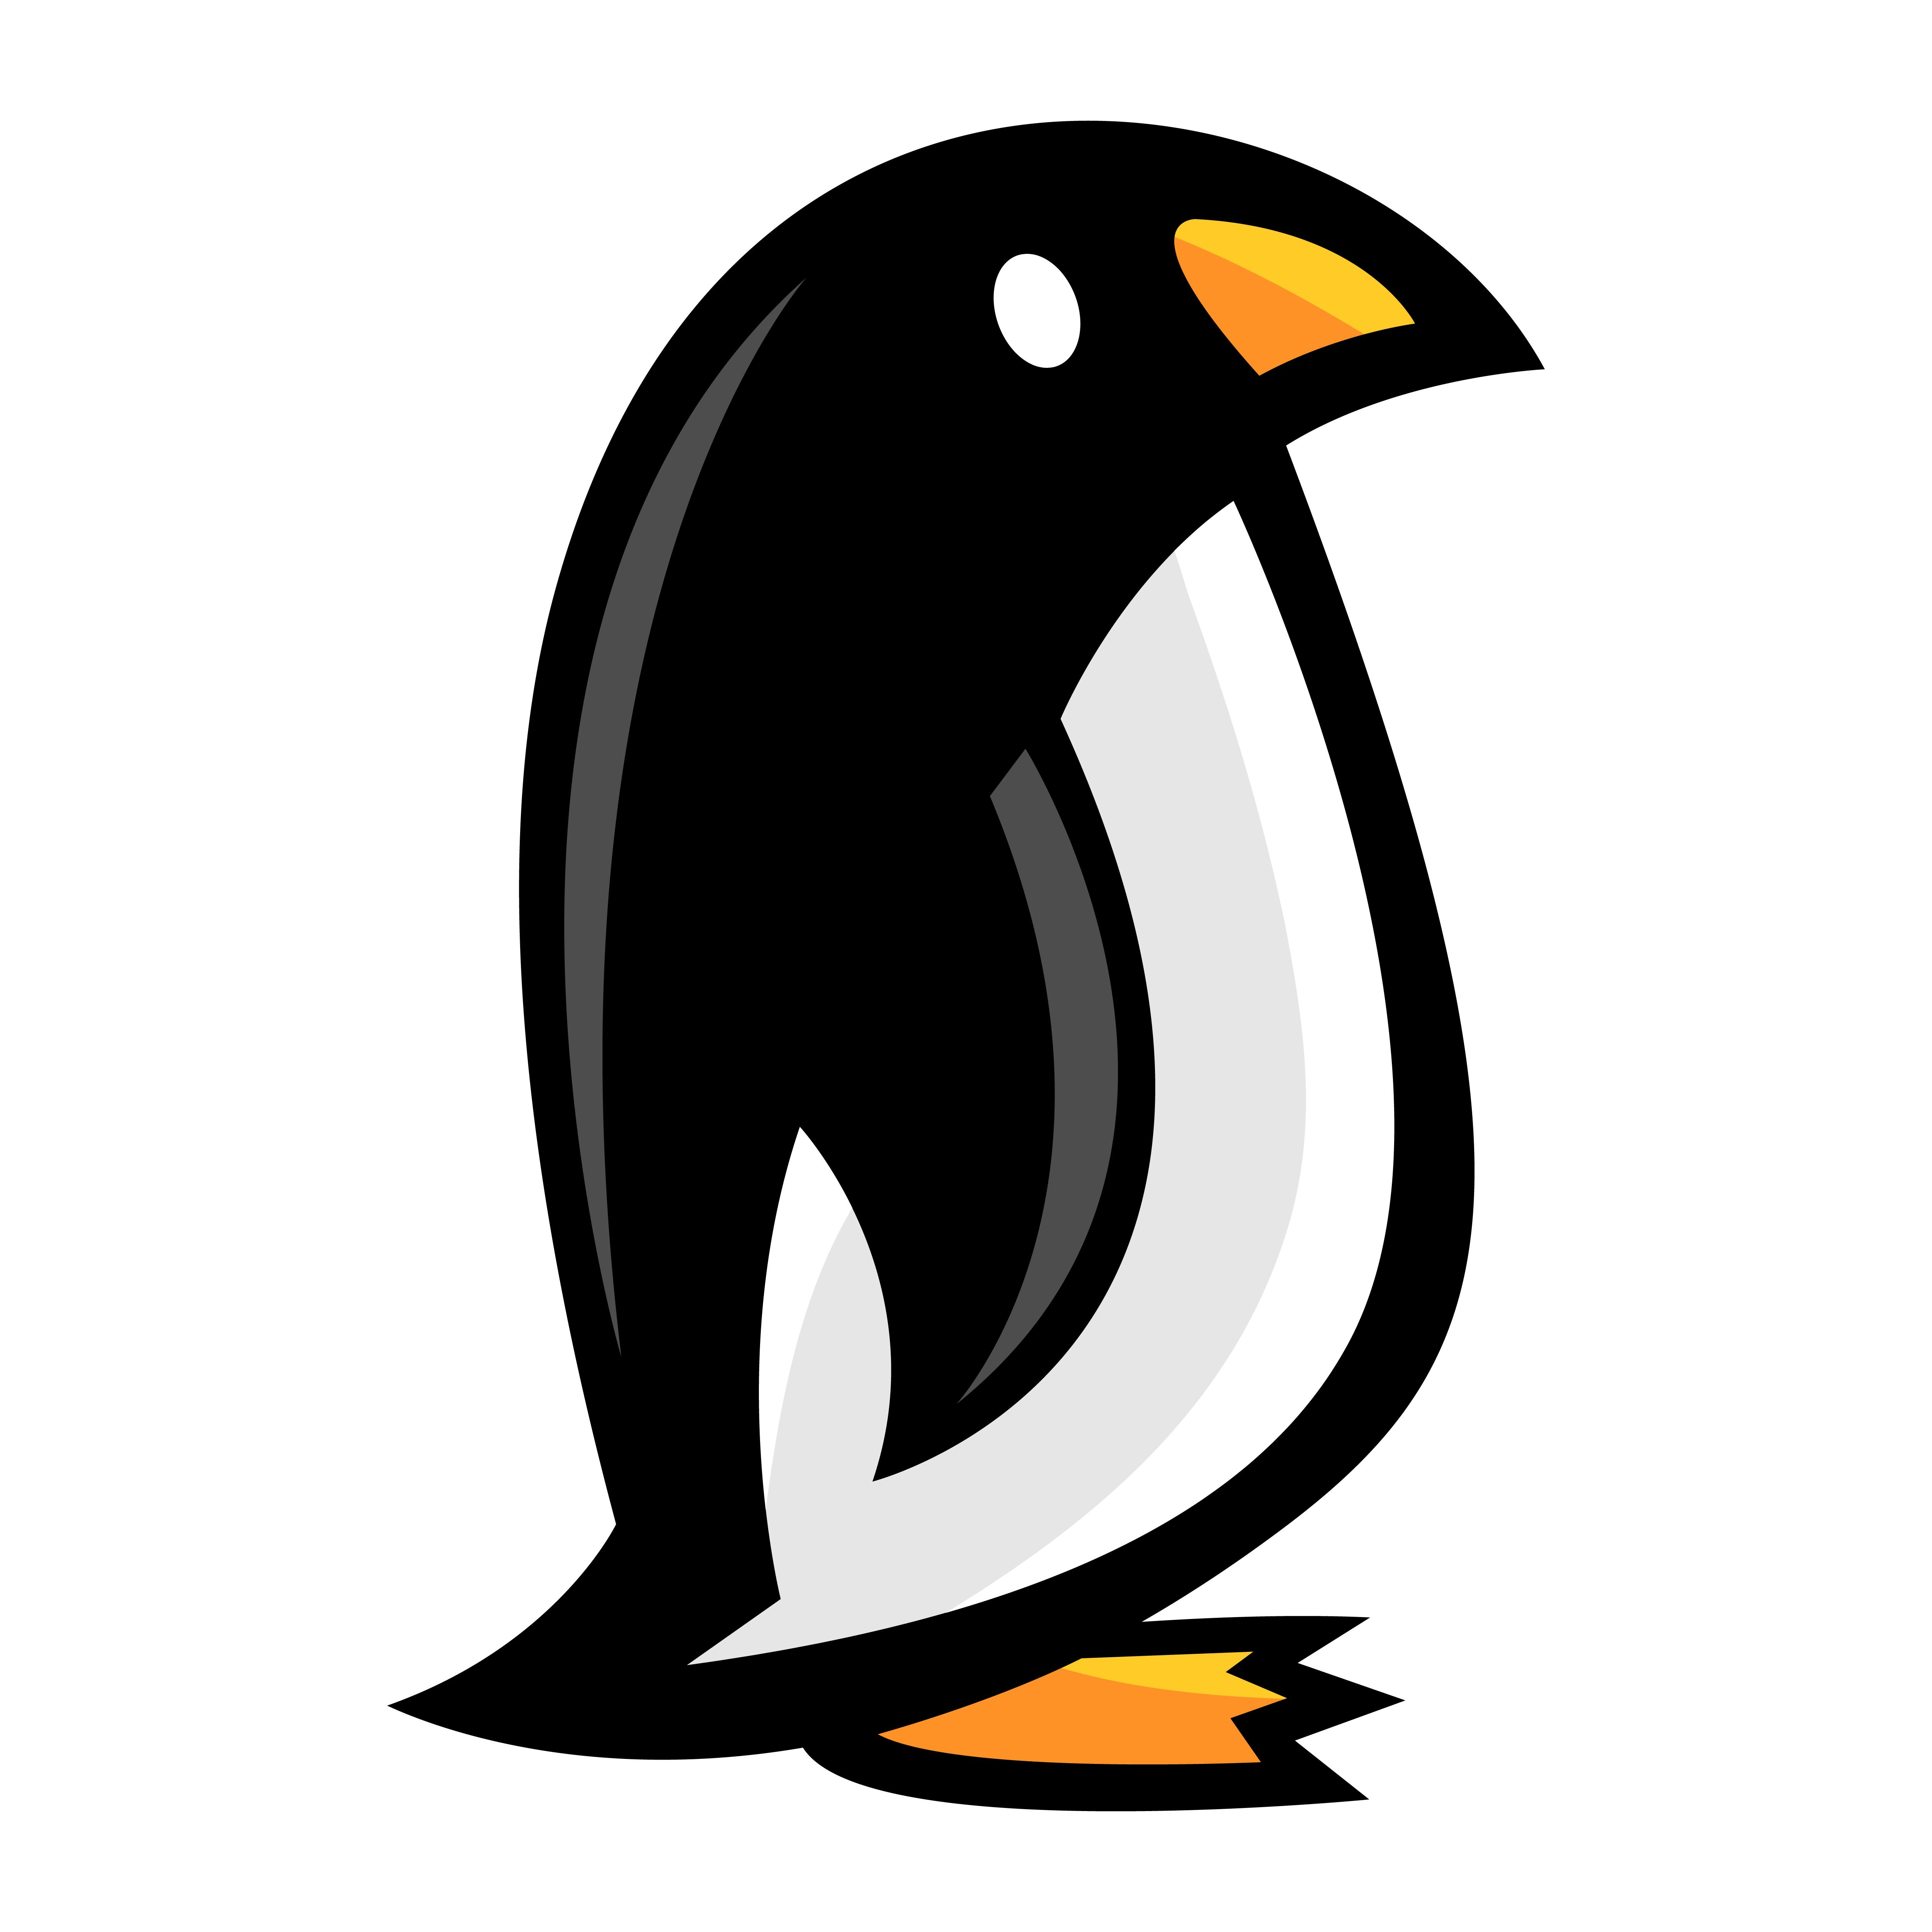 Penguin cartoon illustration - Download Free Vectors ...